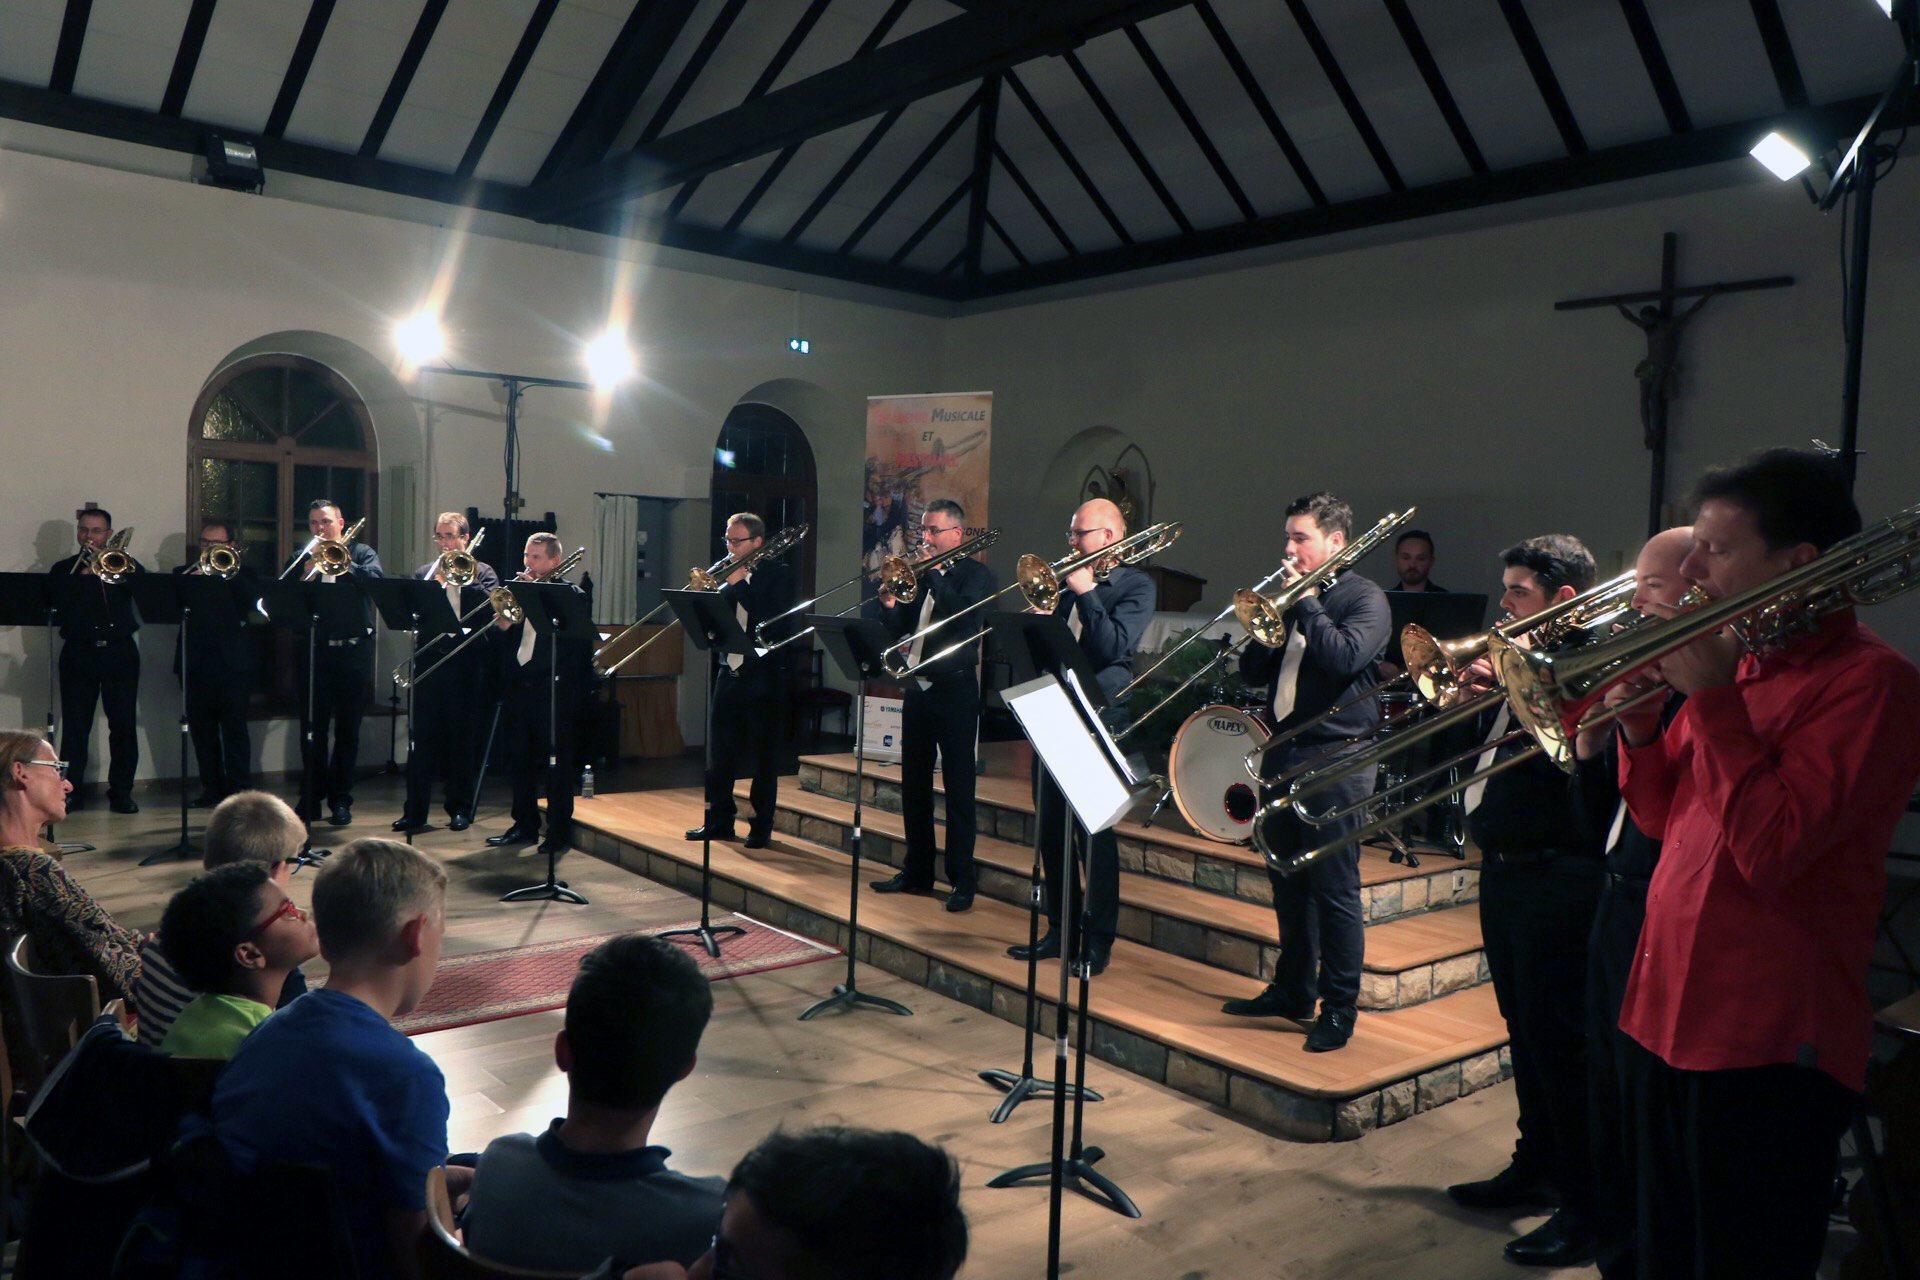 festival-de-trombone-kingersheim-concert